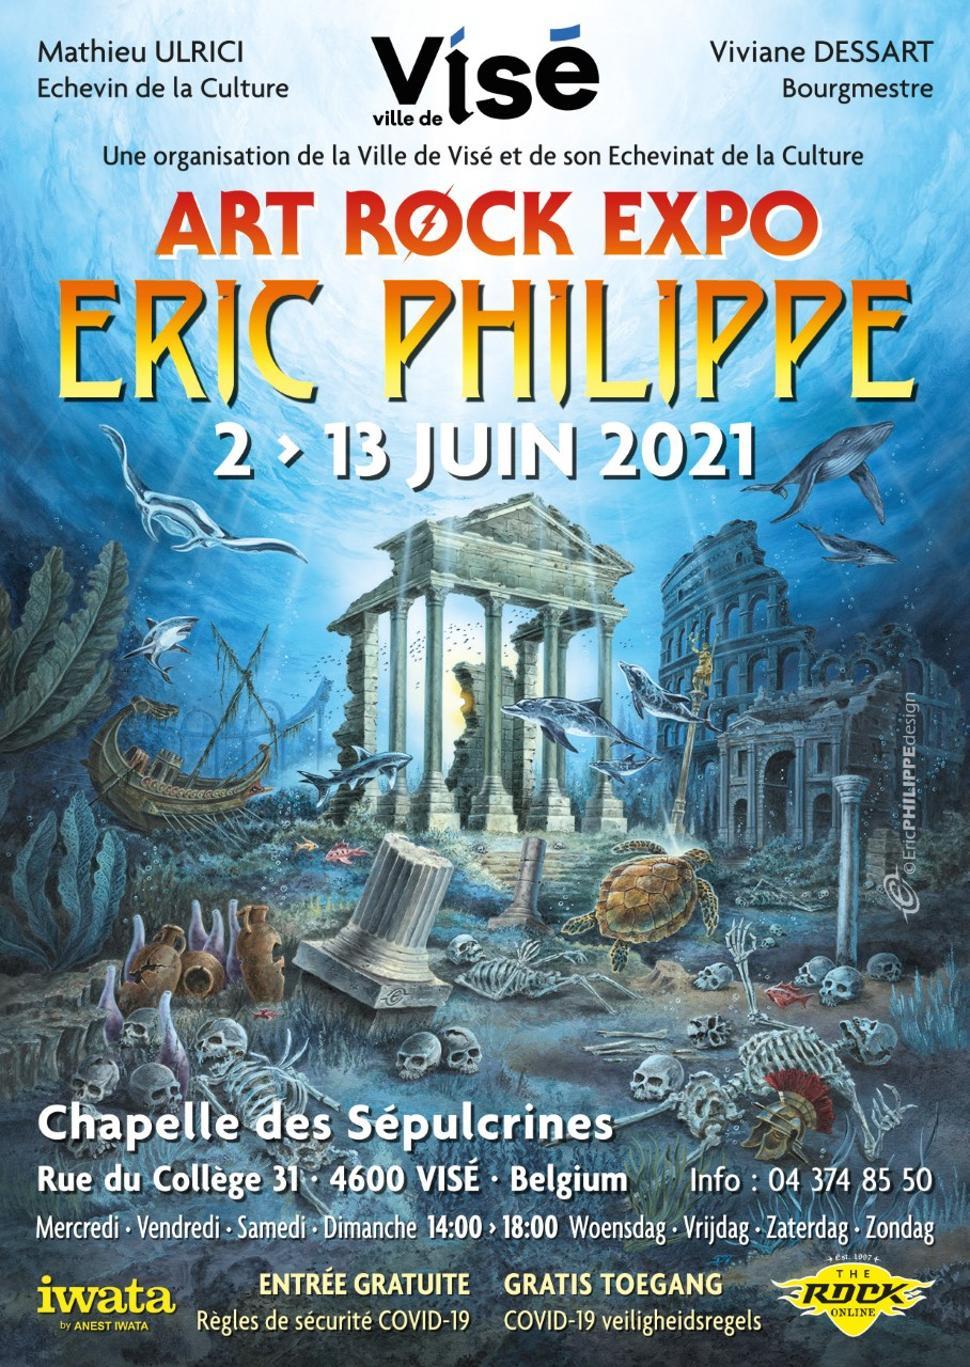 Art Rock Expo ©Eric Philippe 05-2021